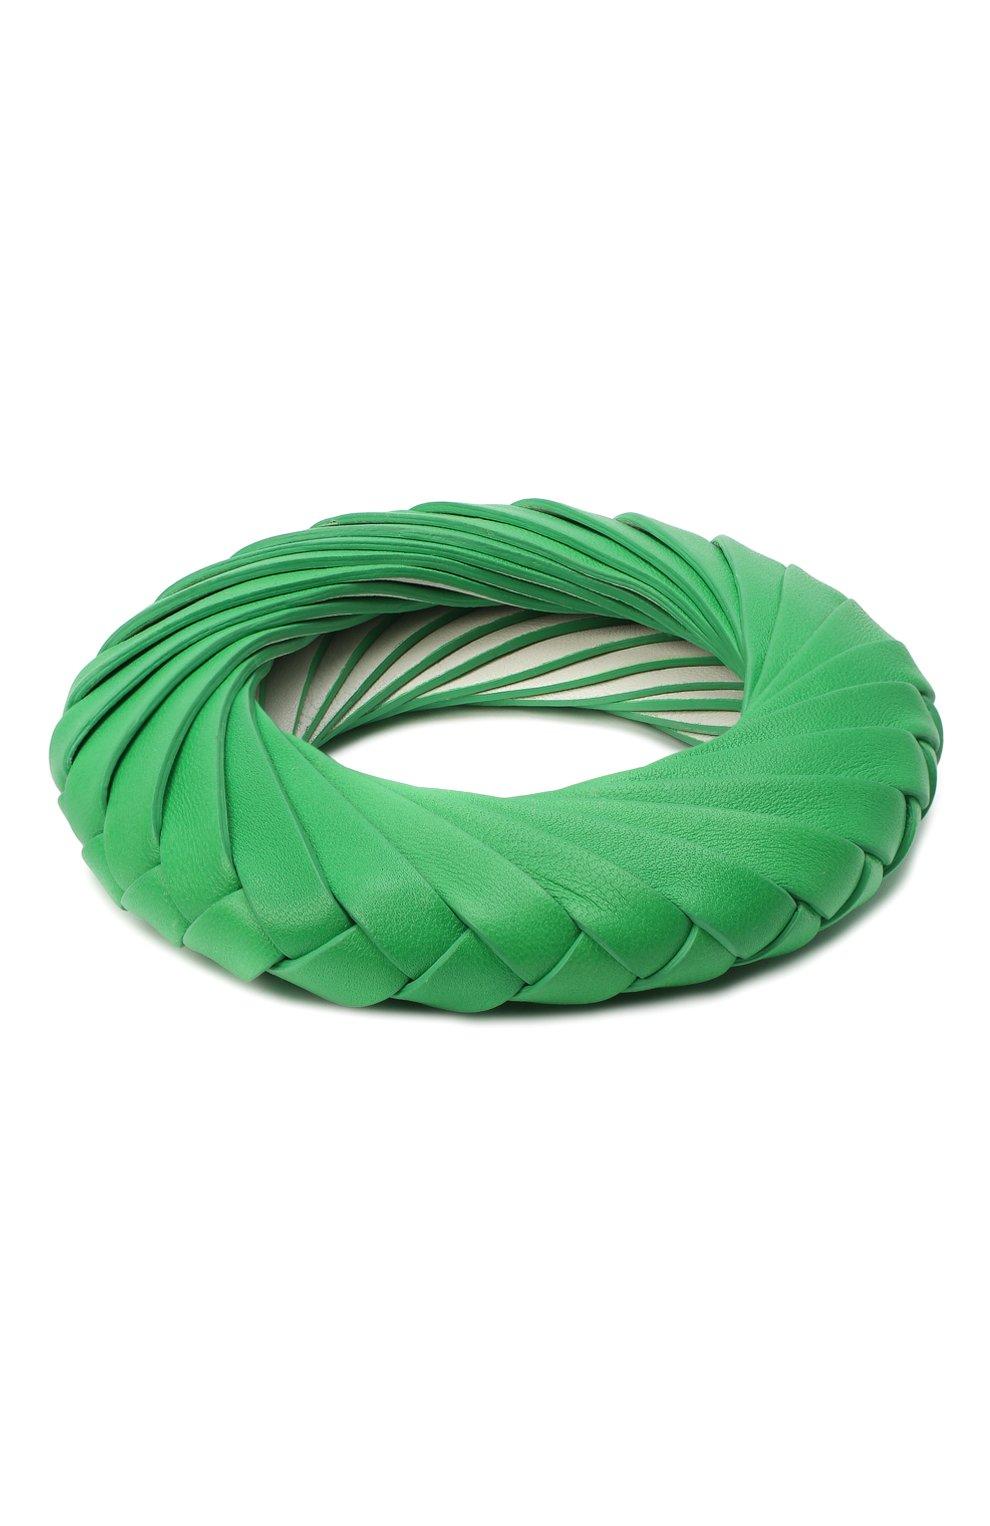 Женский браслет BOTTEGA VENETA зеленого цвета, арт. 629376/V0050 | Фото 1